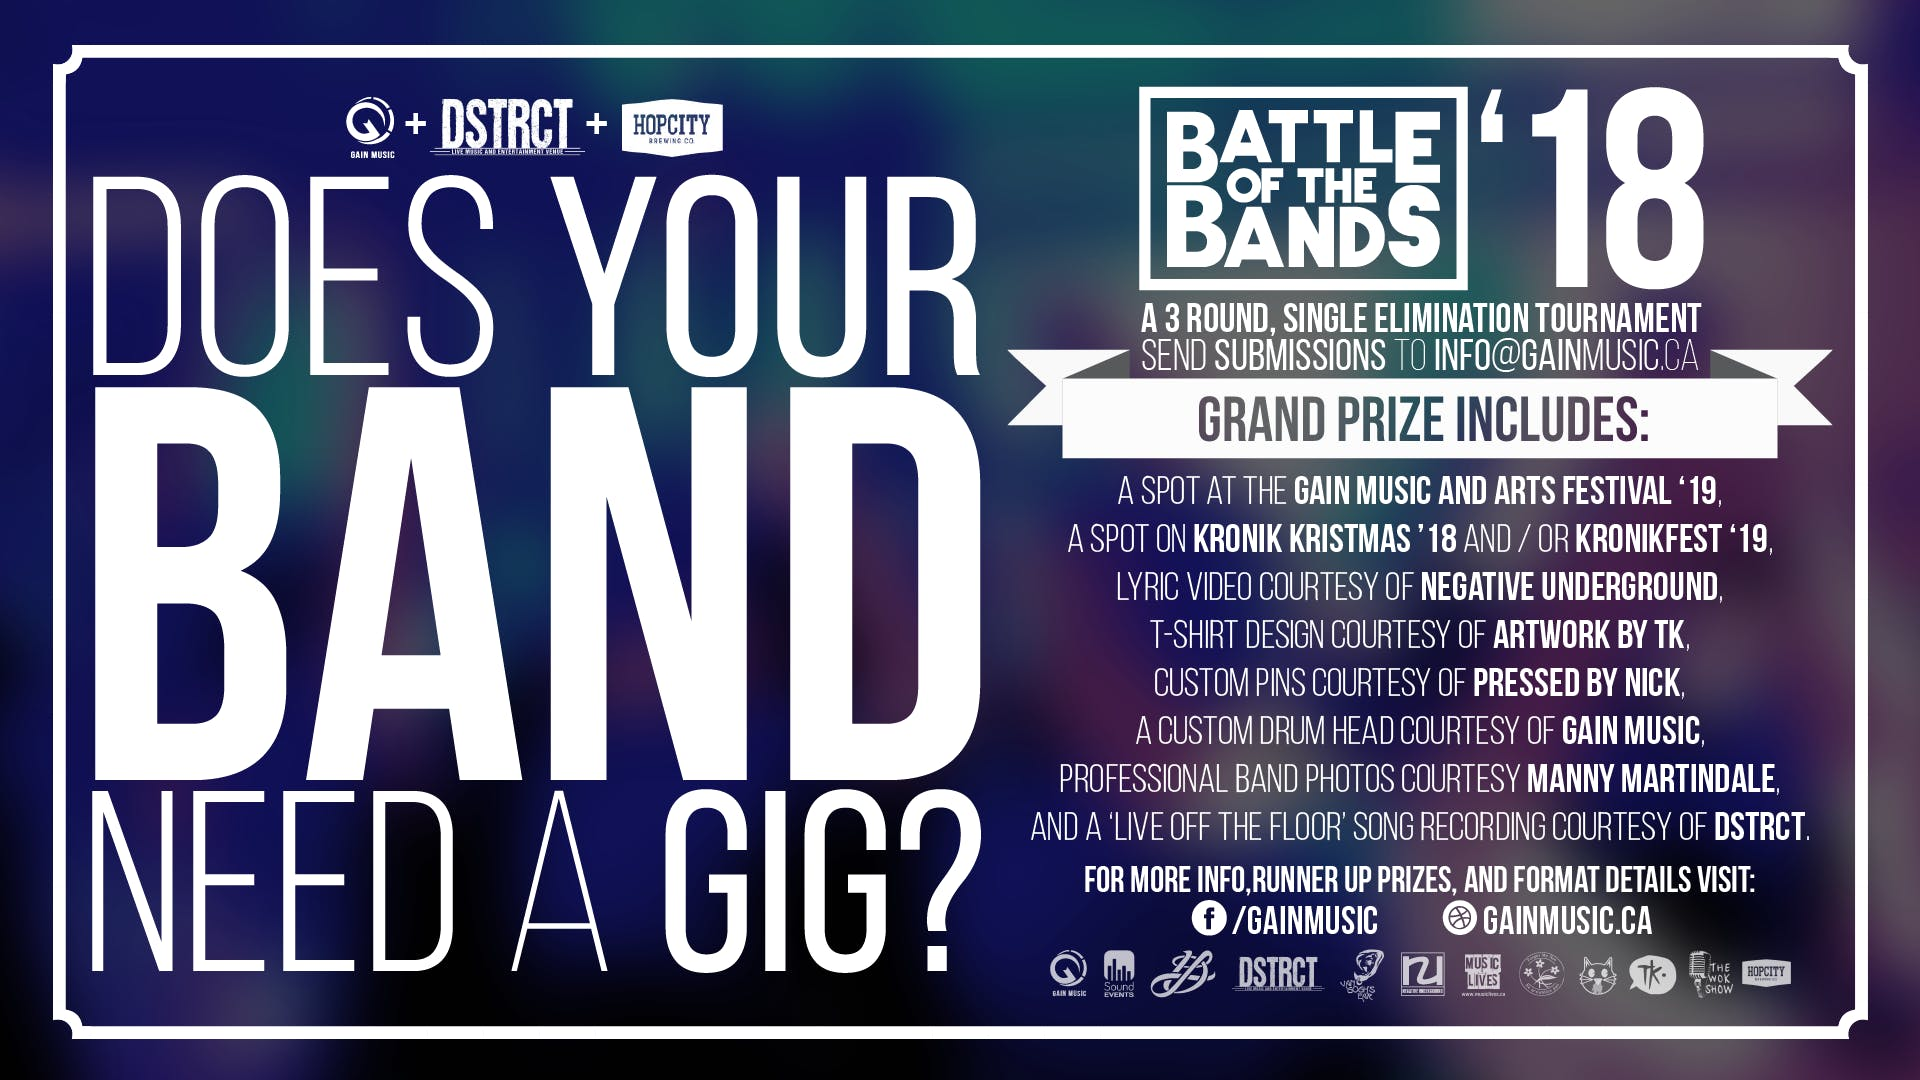 GAIN Music Battle of the Bands - BATTLE #1